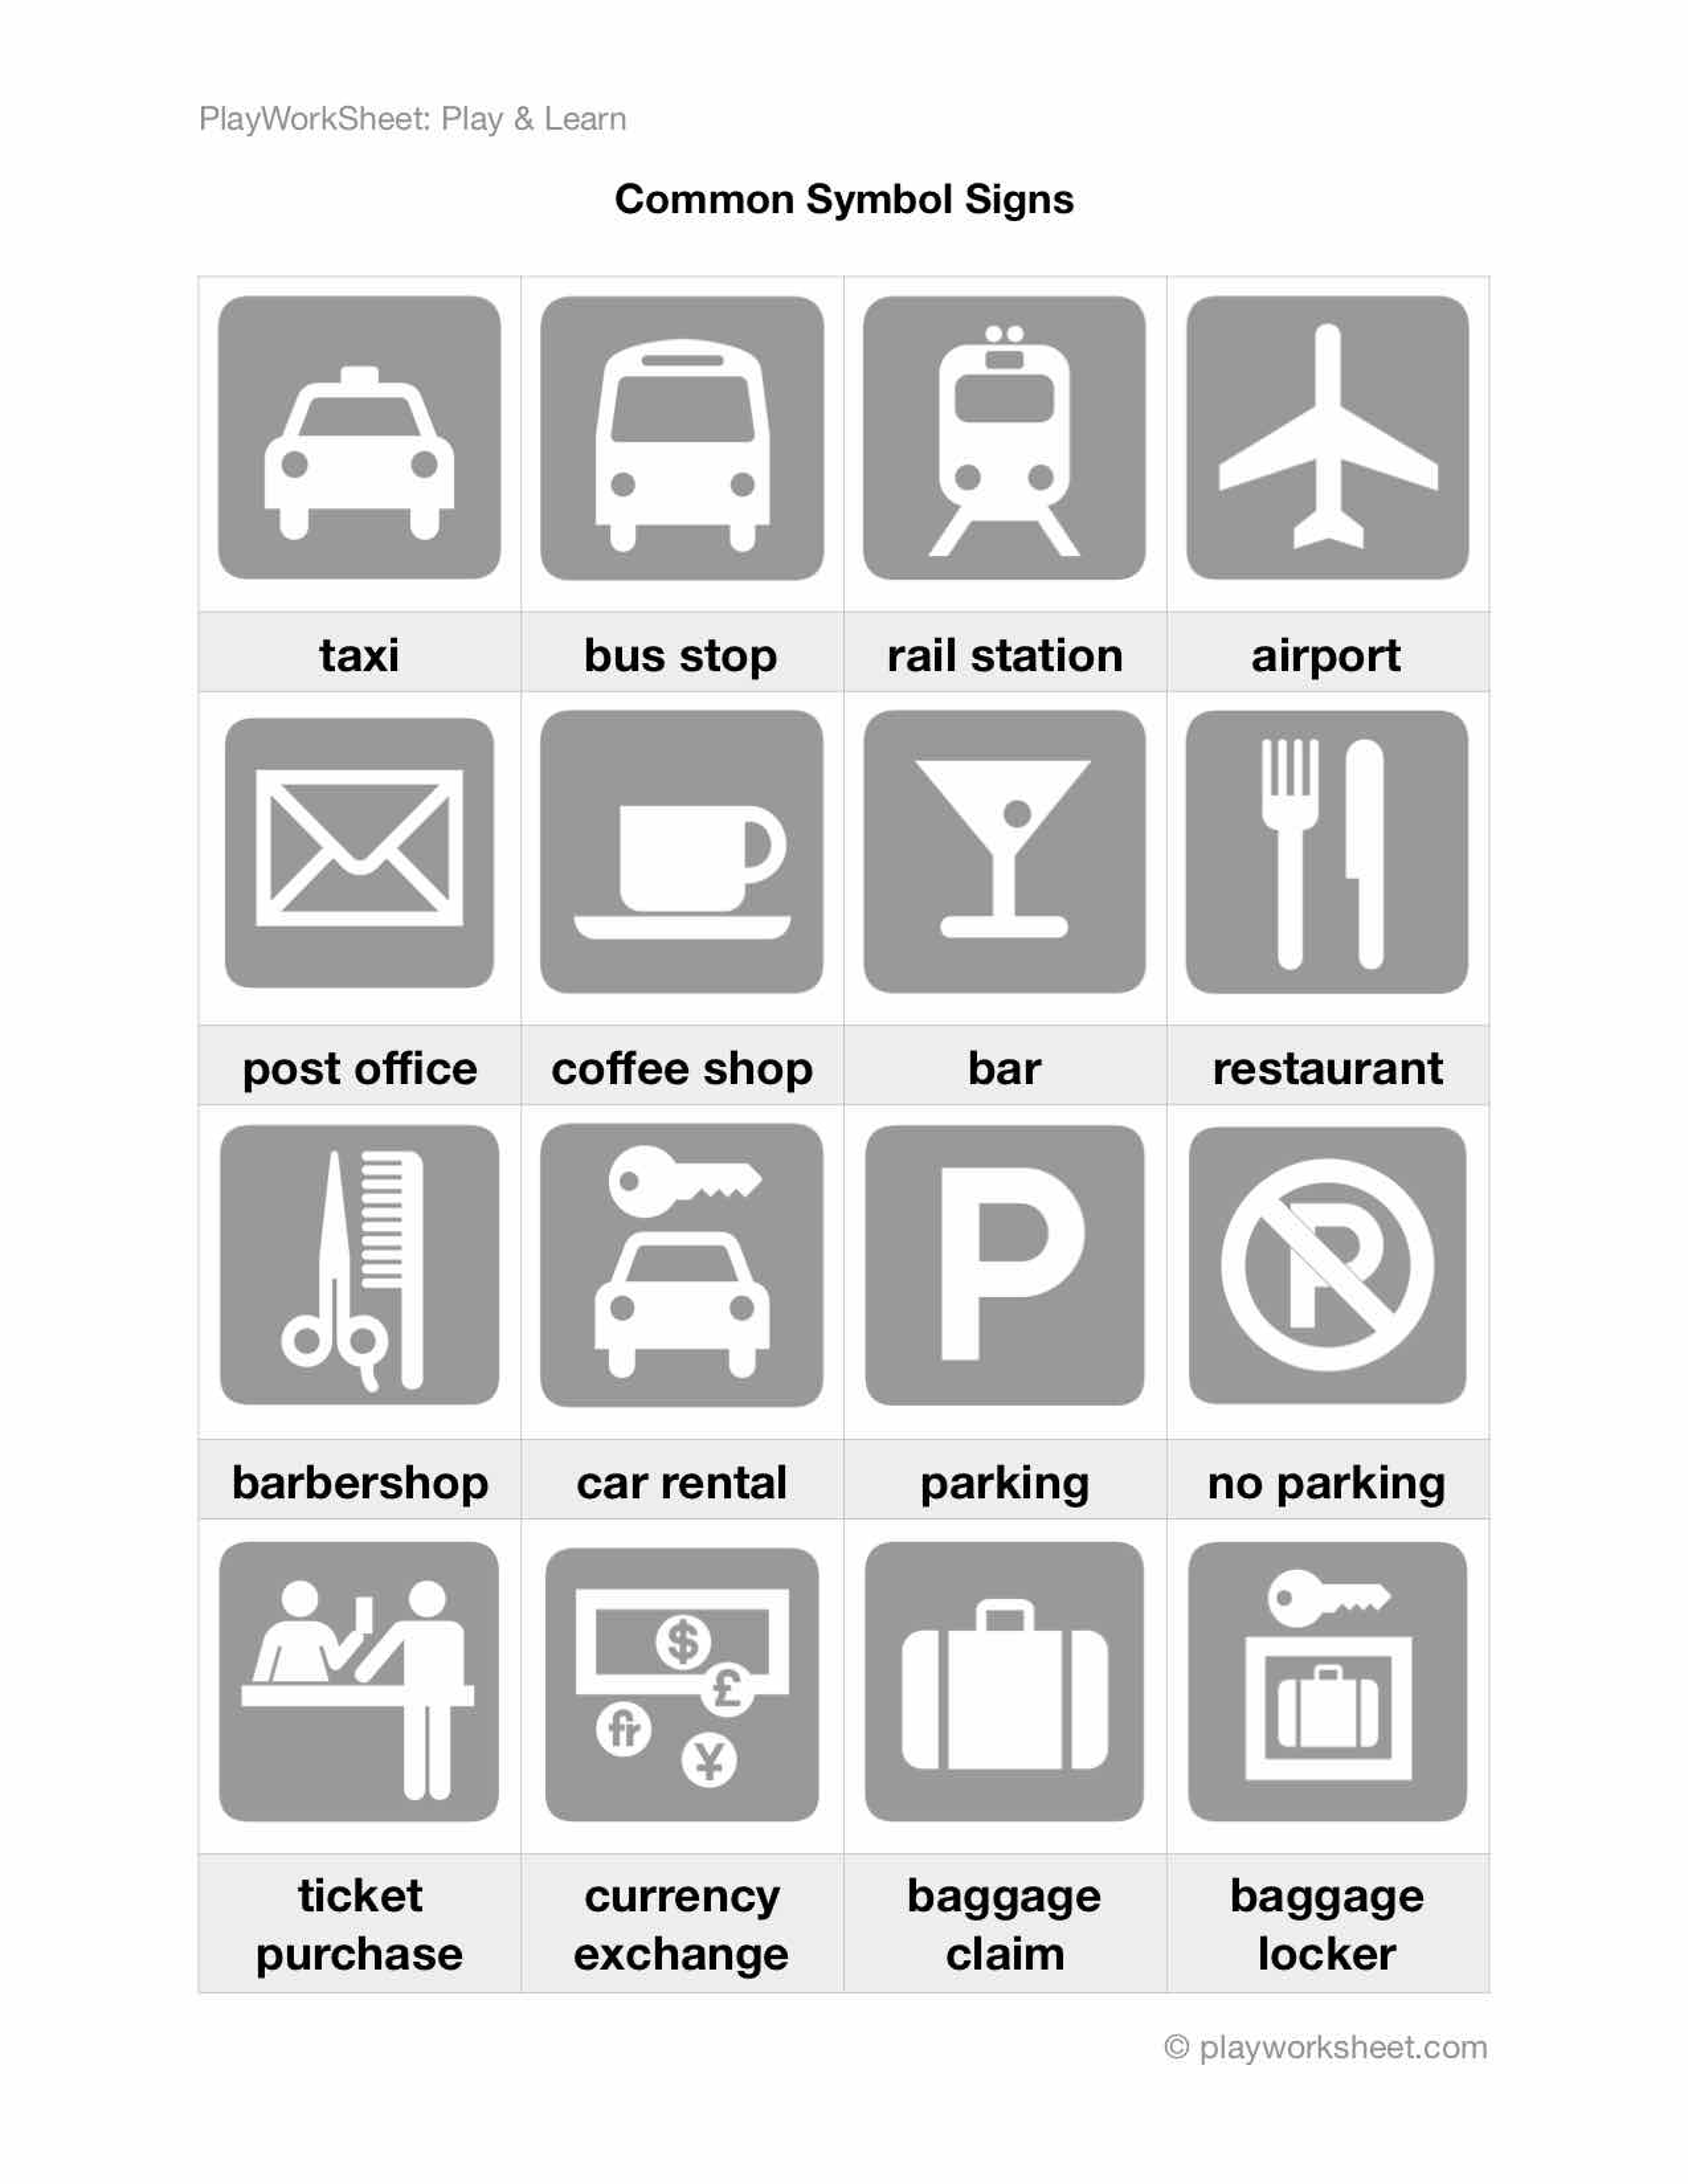 Common Symbol Signs